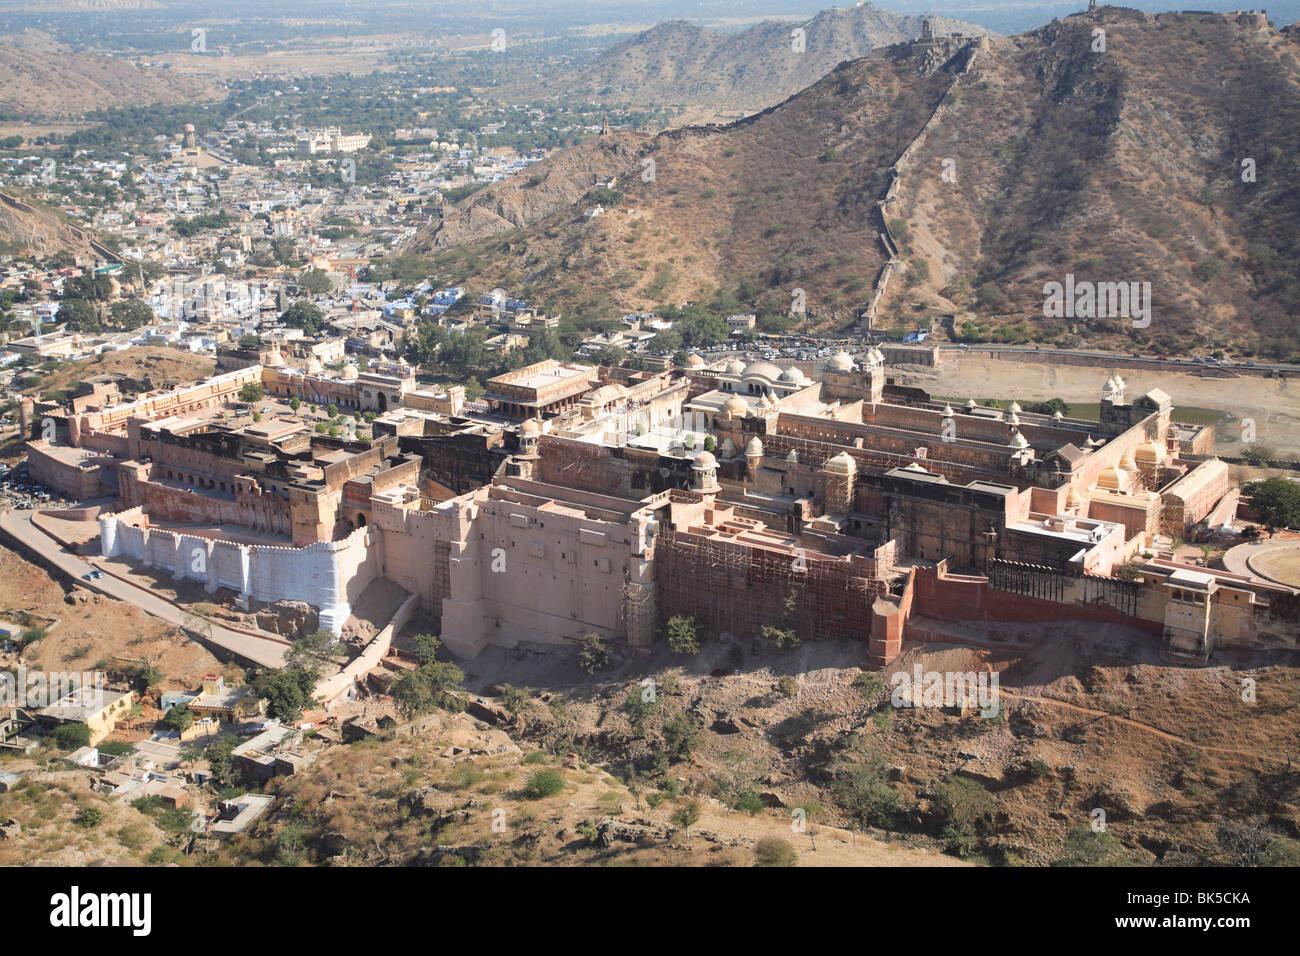 Vista aerea del Forte Amber Palace Jaipur, Rajasthan, India, Asia Immagini Stock